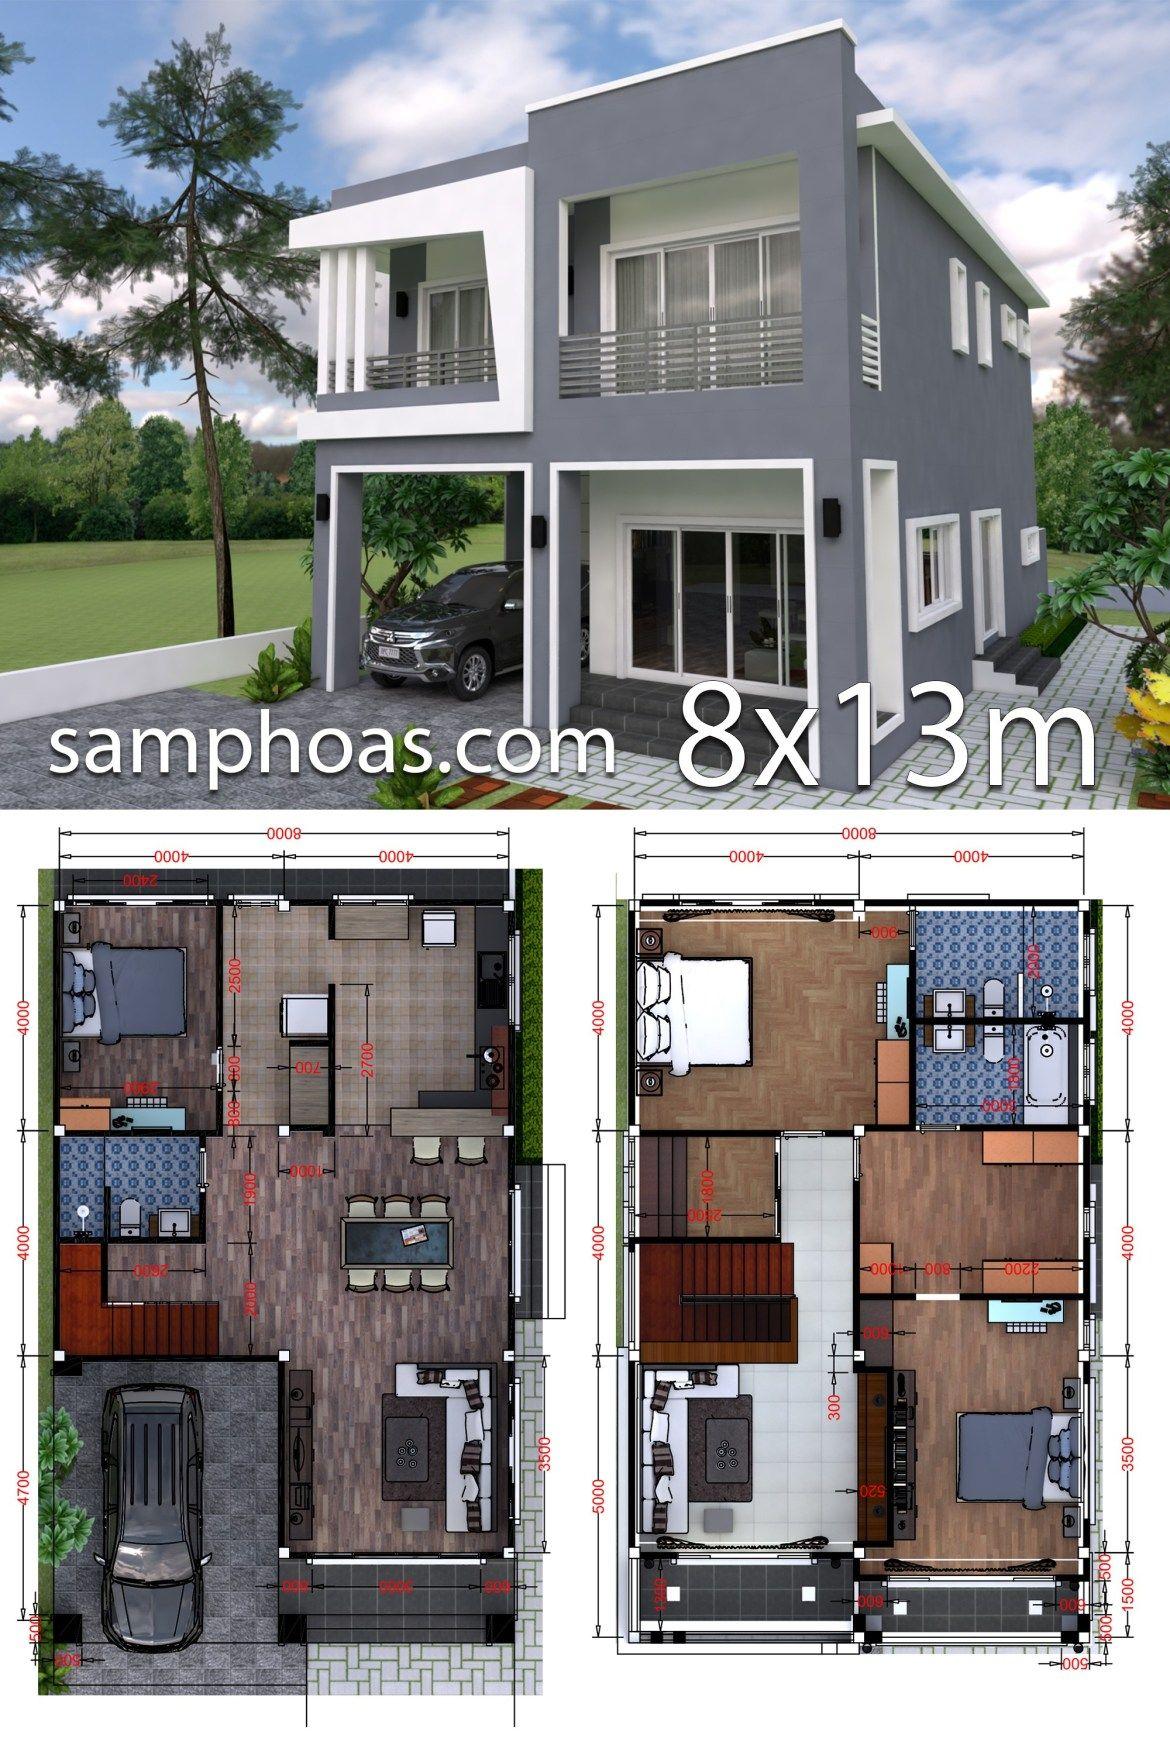 Plan 3d Interior Design Home Plan 8x13m Full Plan 3beds Samphoas Plansearch 3d Interior Design 3d Home Design House Design